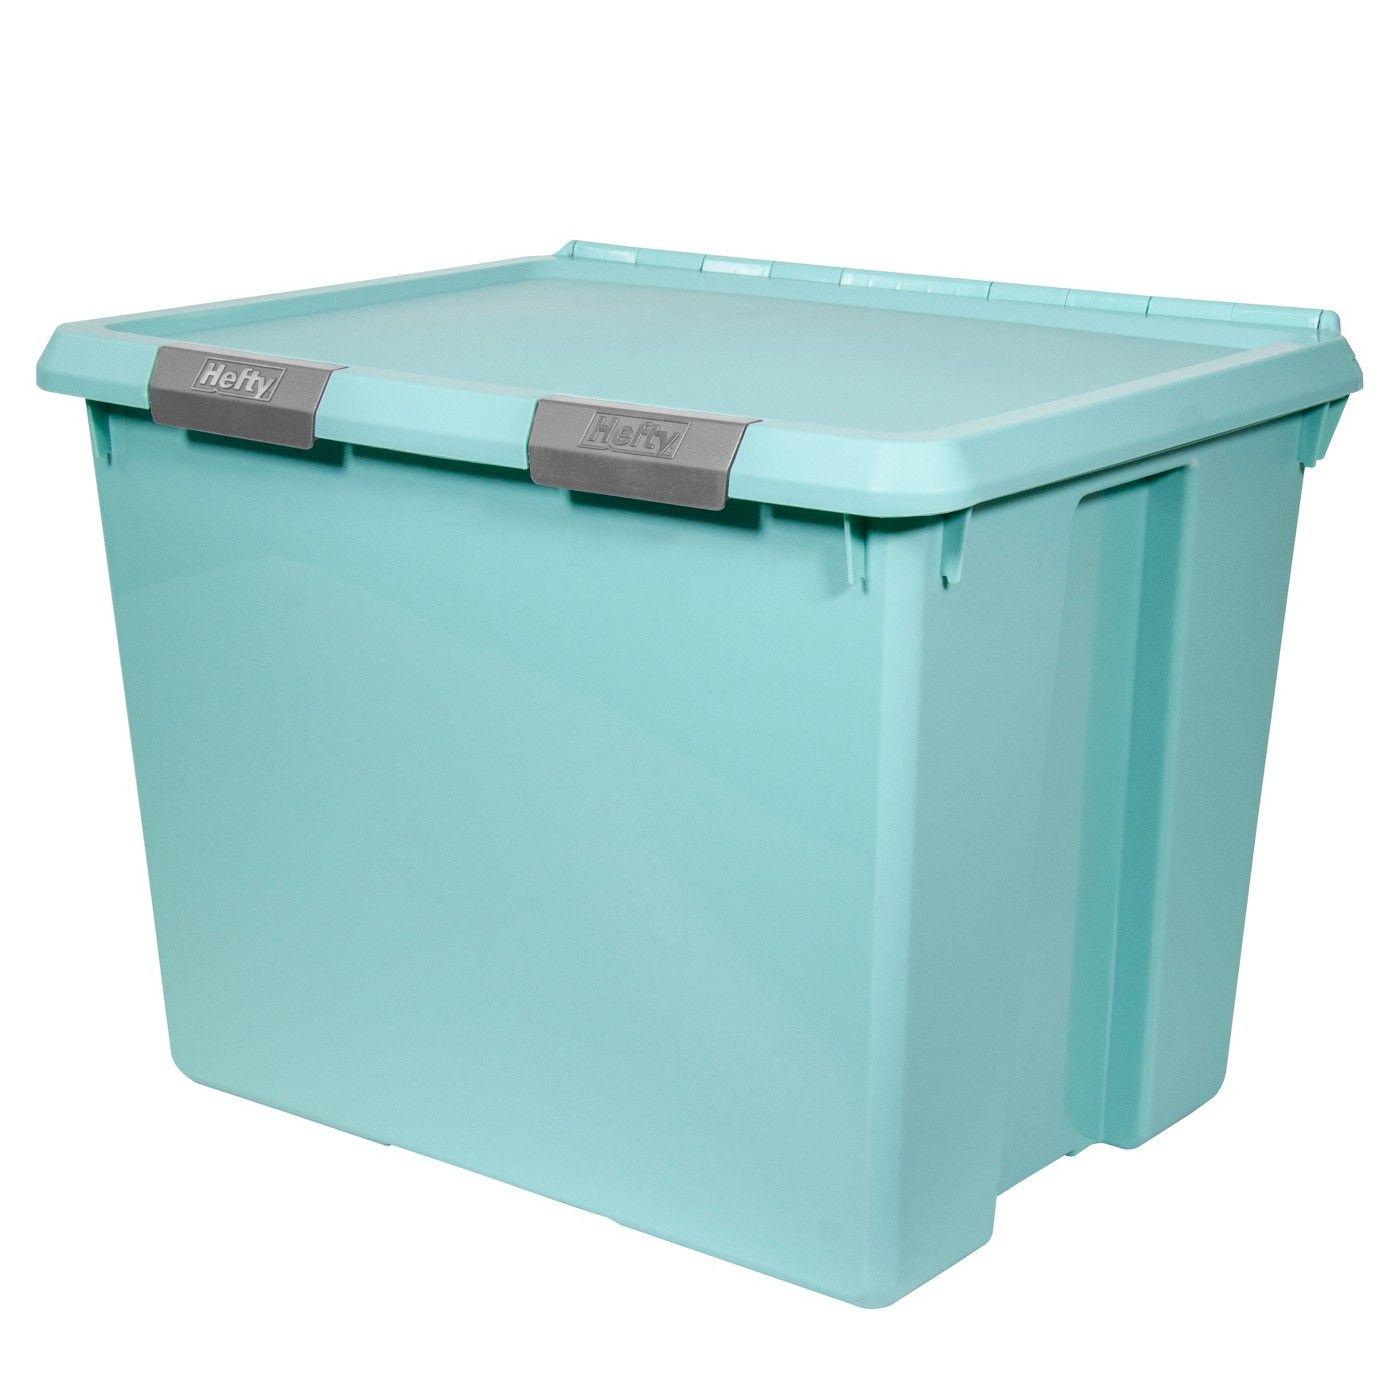 Hefty Hinged Lid Storage Box Jade Opaque 70qt Image 1 Of 5 Lid Storage Storage Tubs Utility Storage